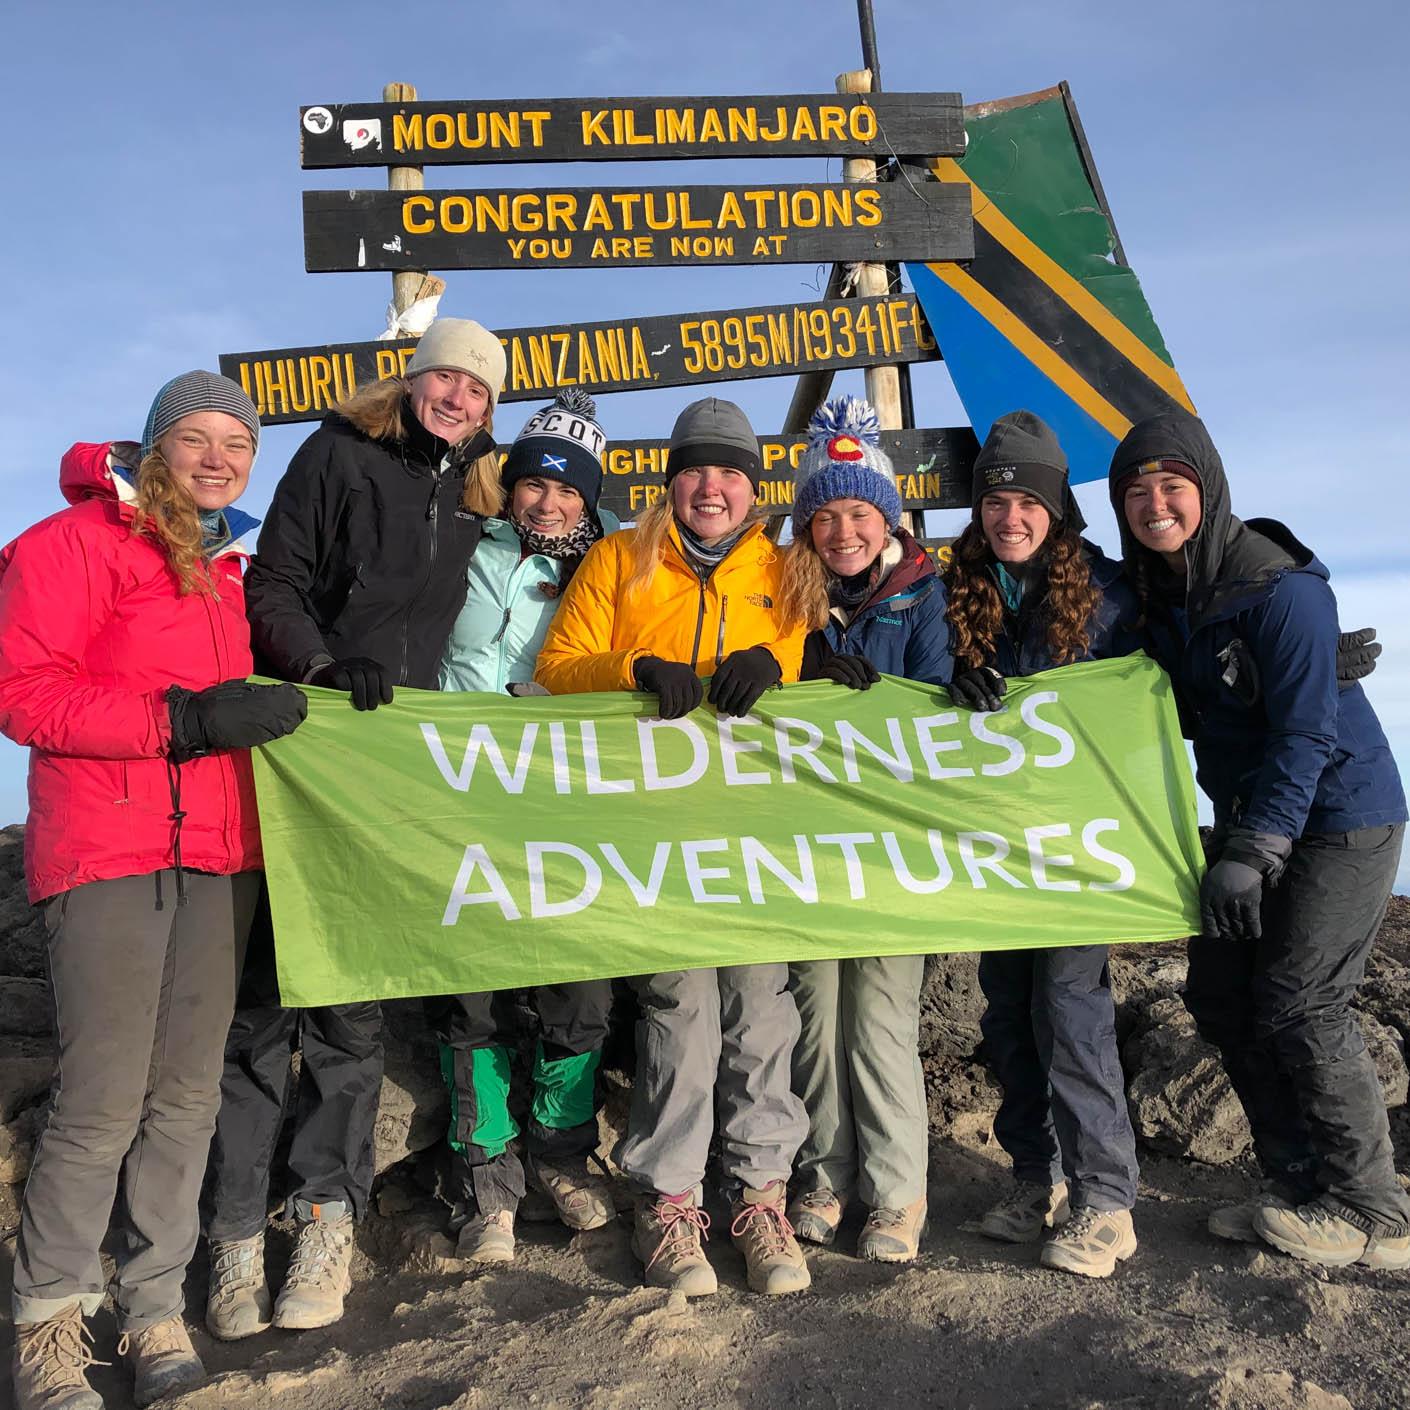 Kilimanjaro backpacking